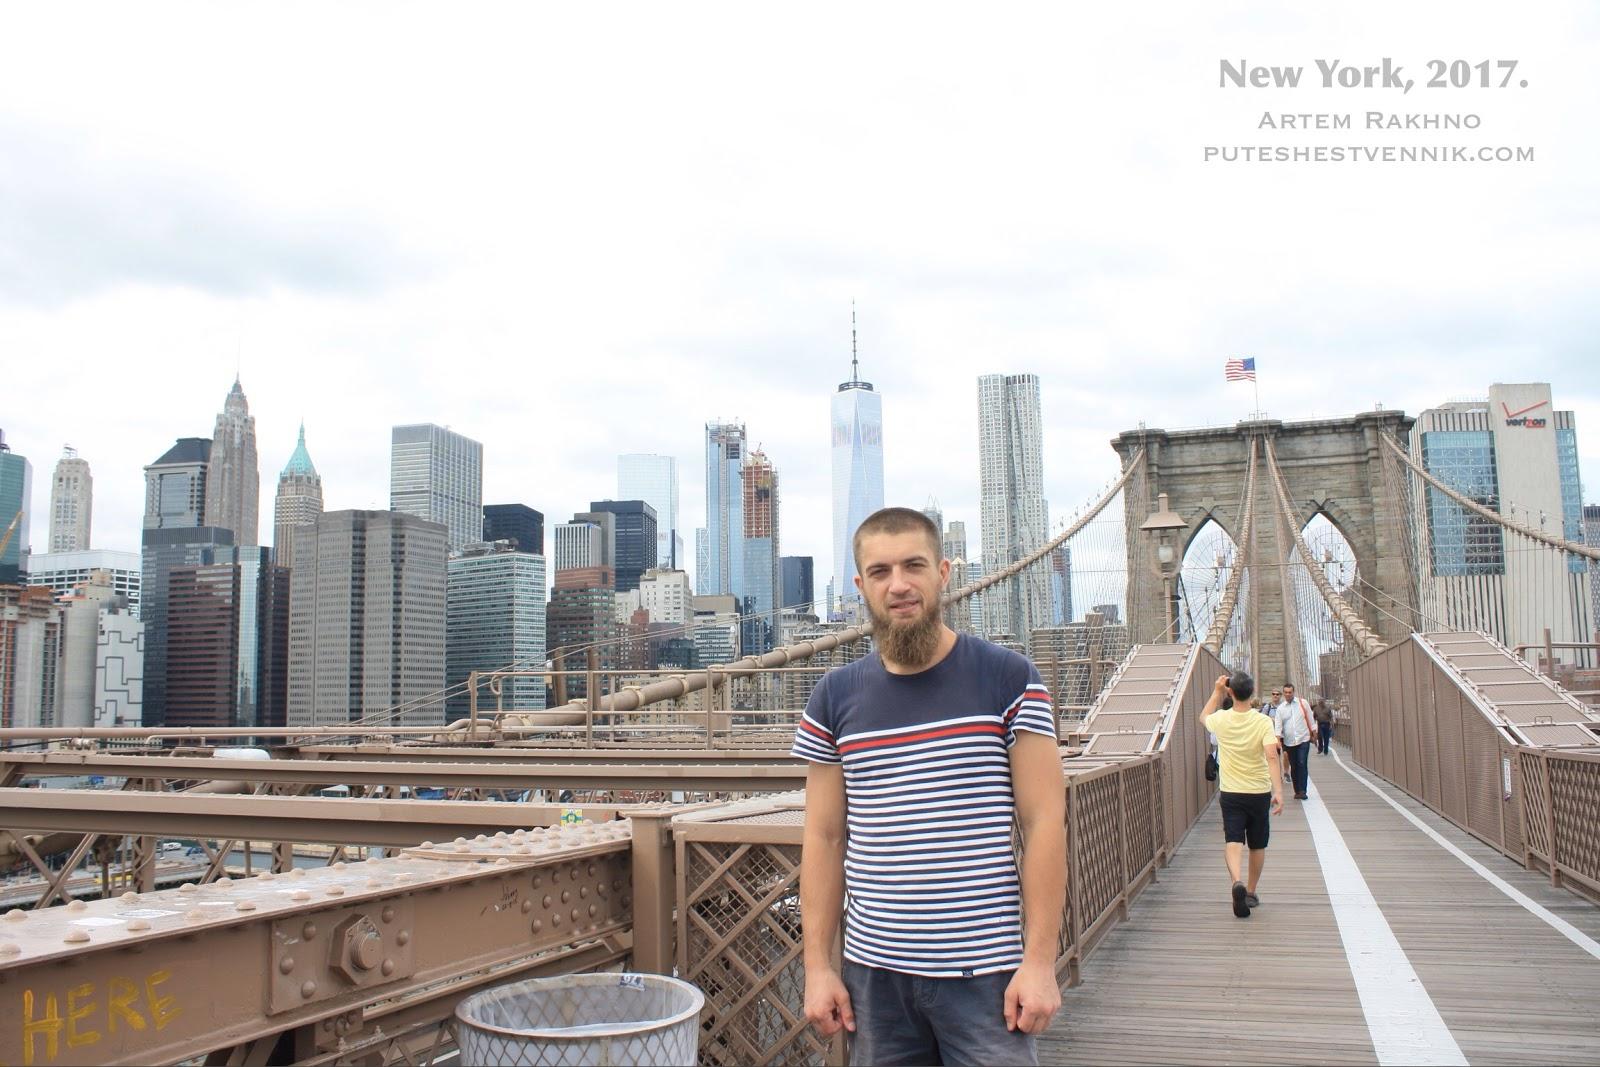 Путешественник на Бруклинском мосту